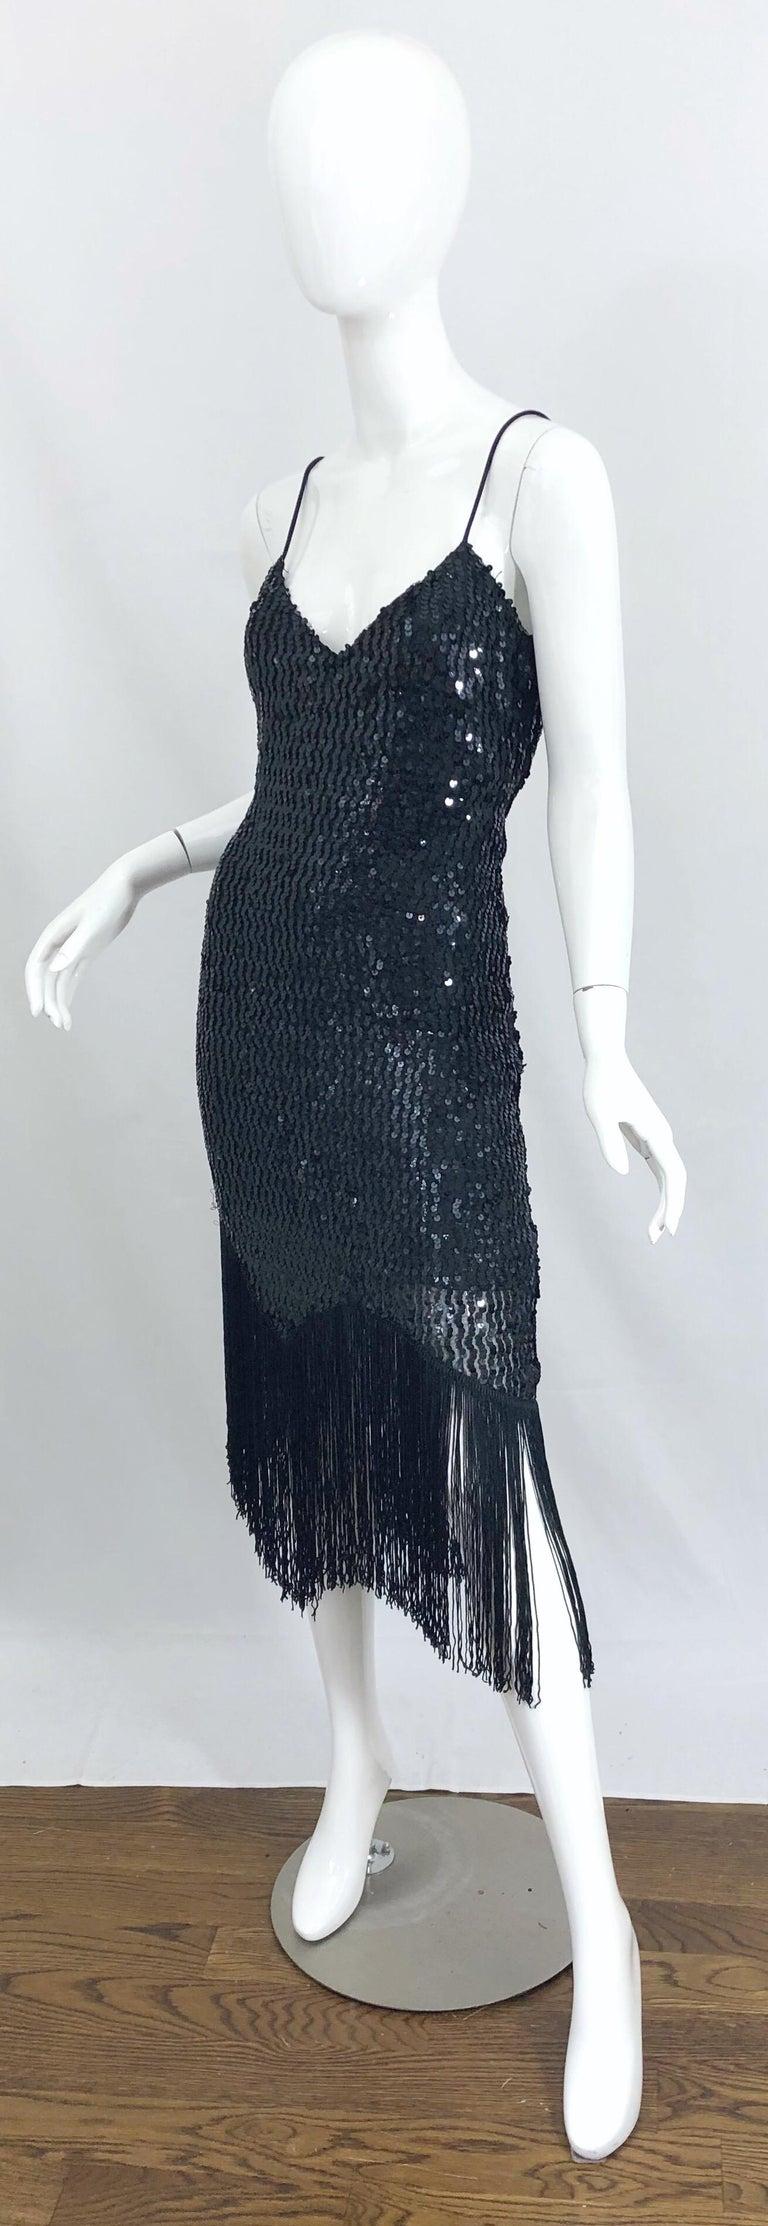 NWT 1970s Joy Stevens Size 10 / 12 Black Sequined Flapper Style Vintage Dress For Sale 2